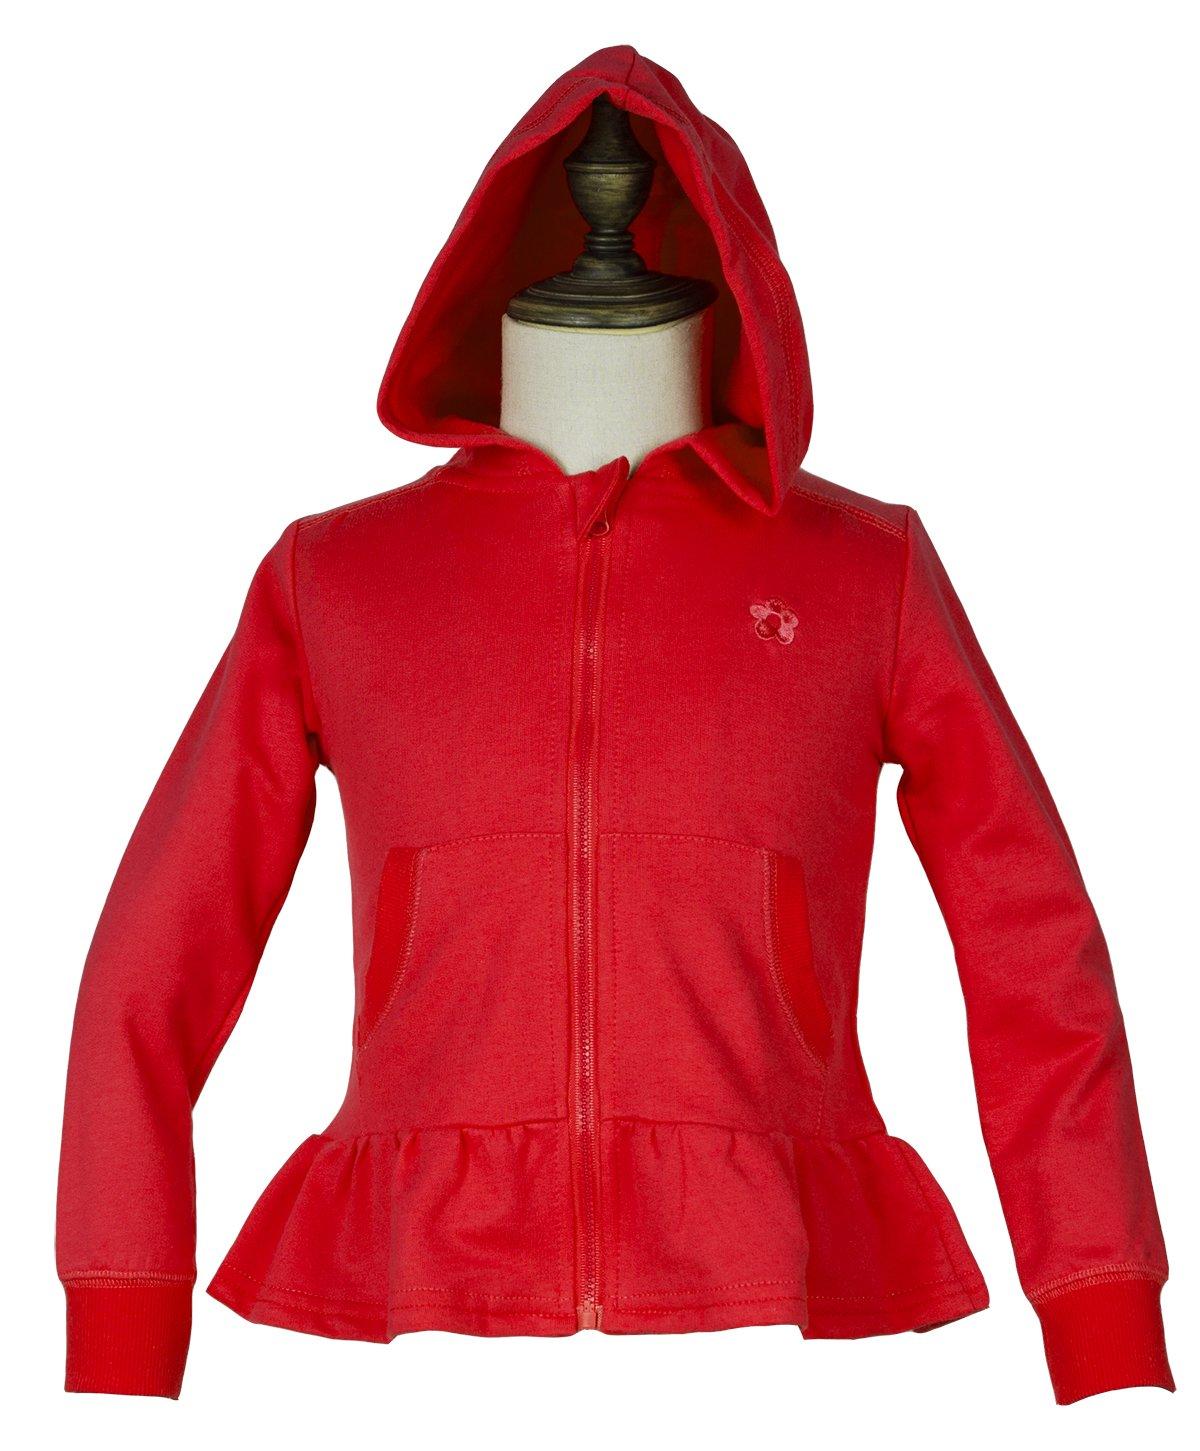 Girls' Long Sleeve Full-Zip Ruffle Bottom Jersey Hoodie Knit Jacket 100% Cotton